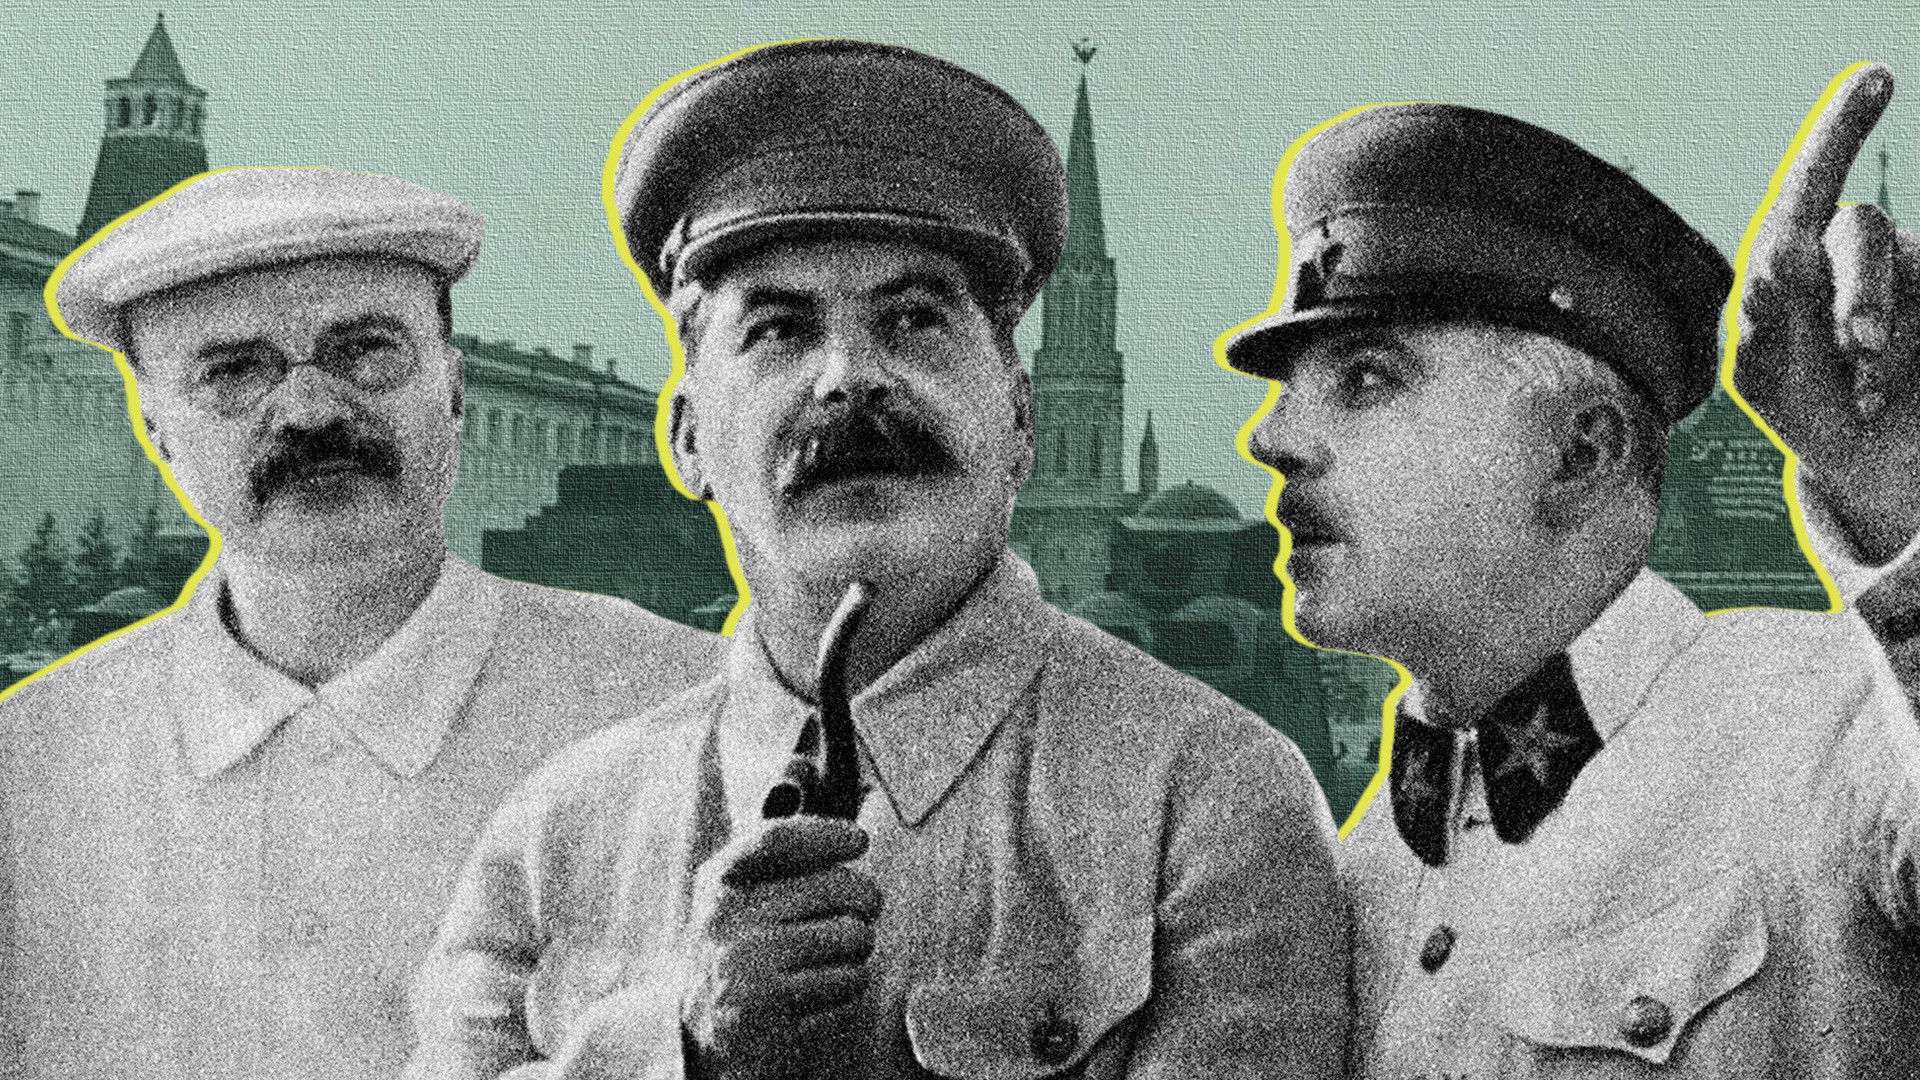 Pictured L-R: Vyacheslav Molotov, Joseph Stalin and Kliment Voroshilov, 1937